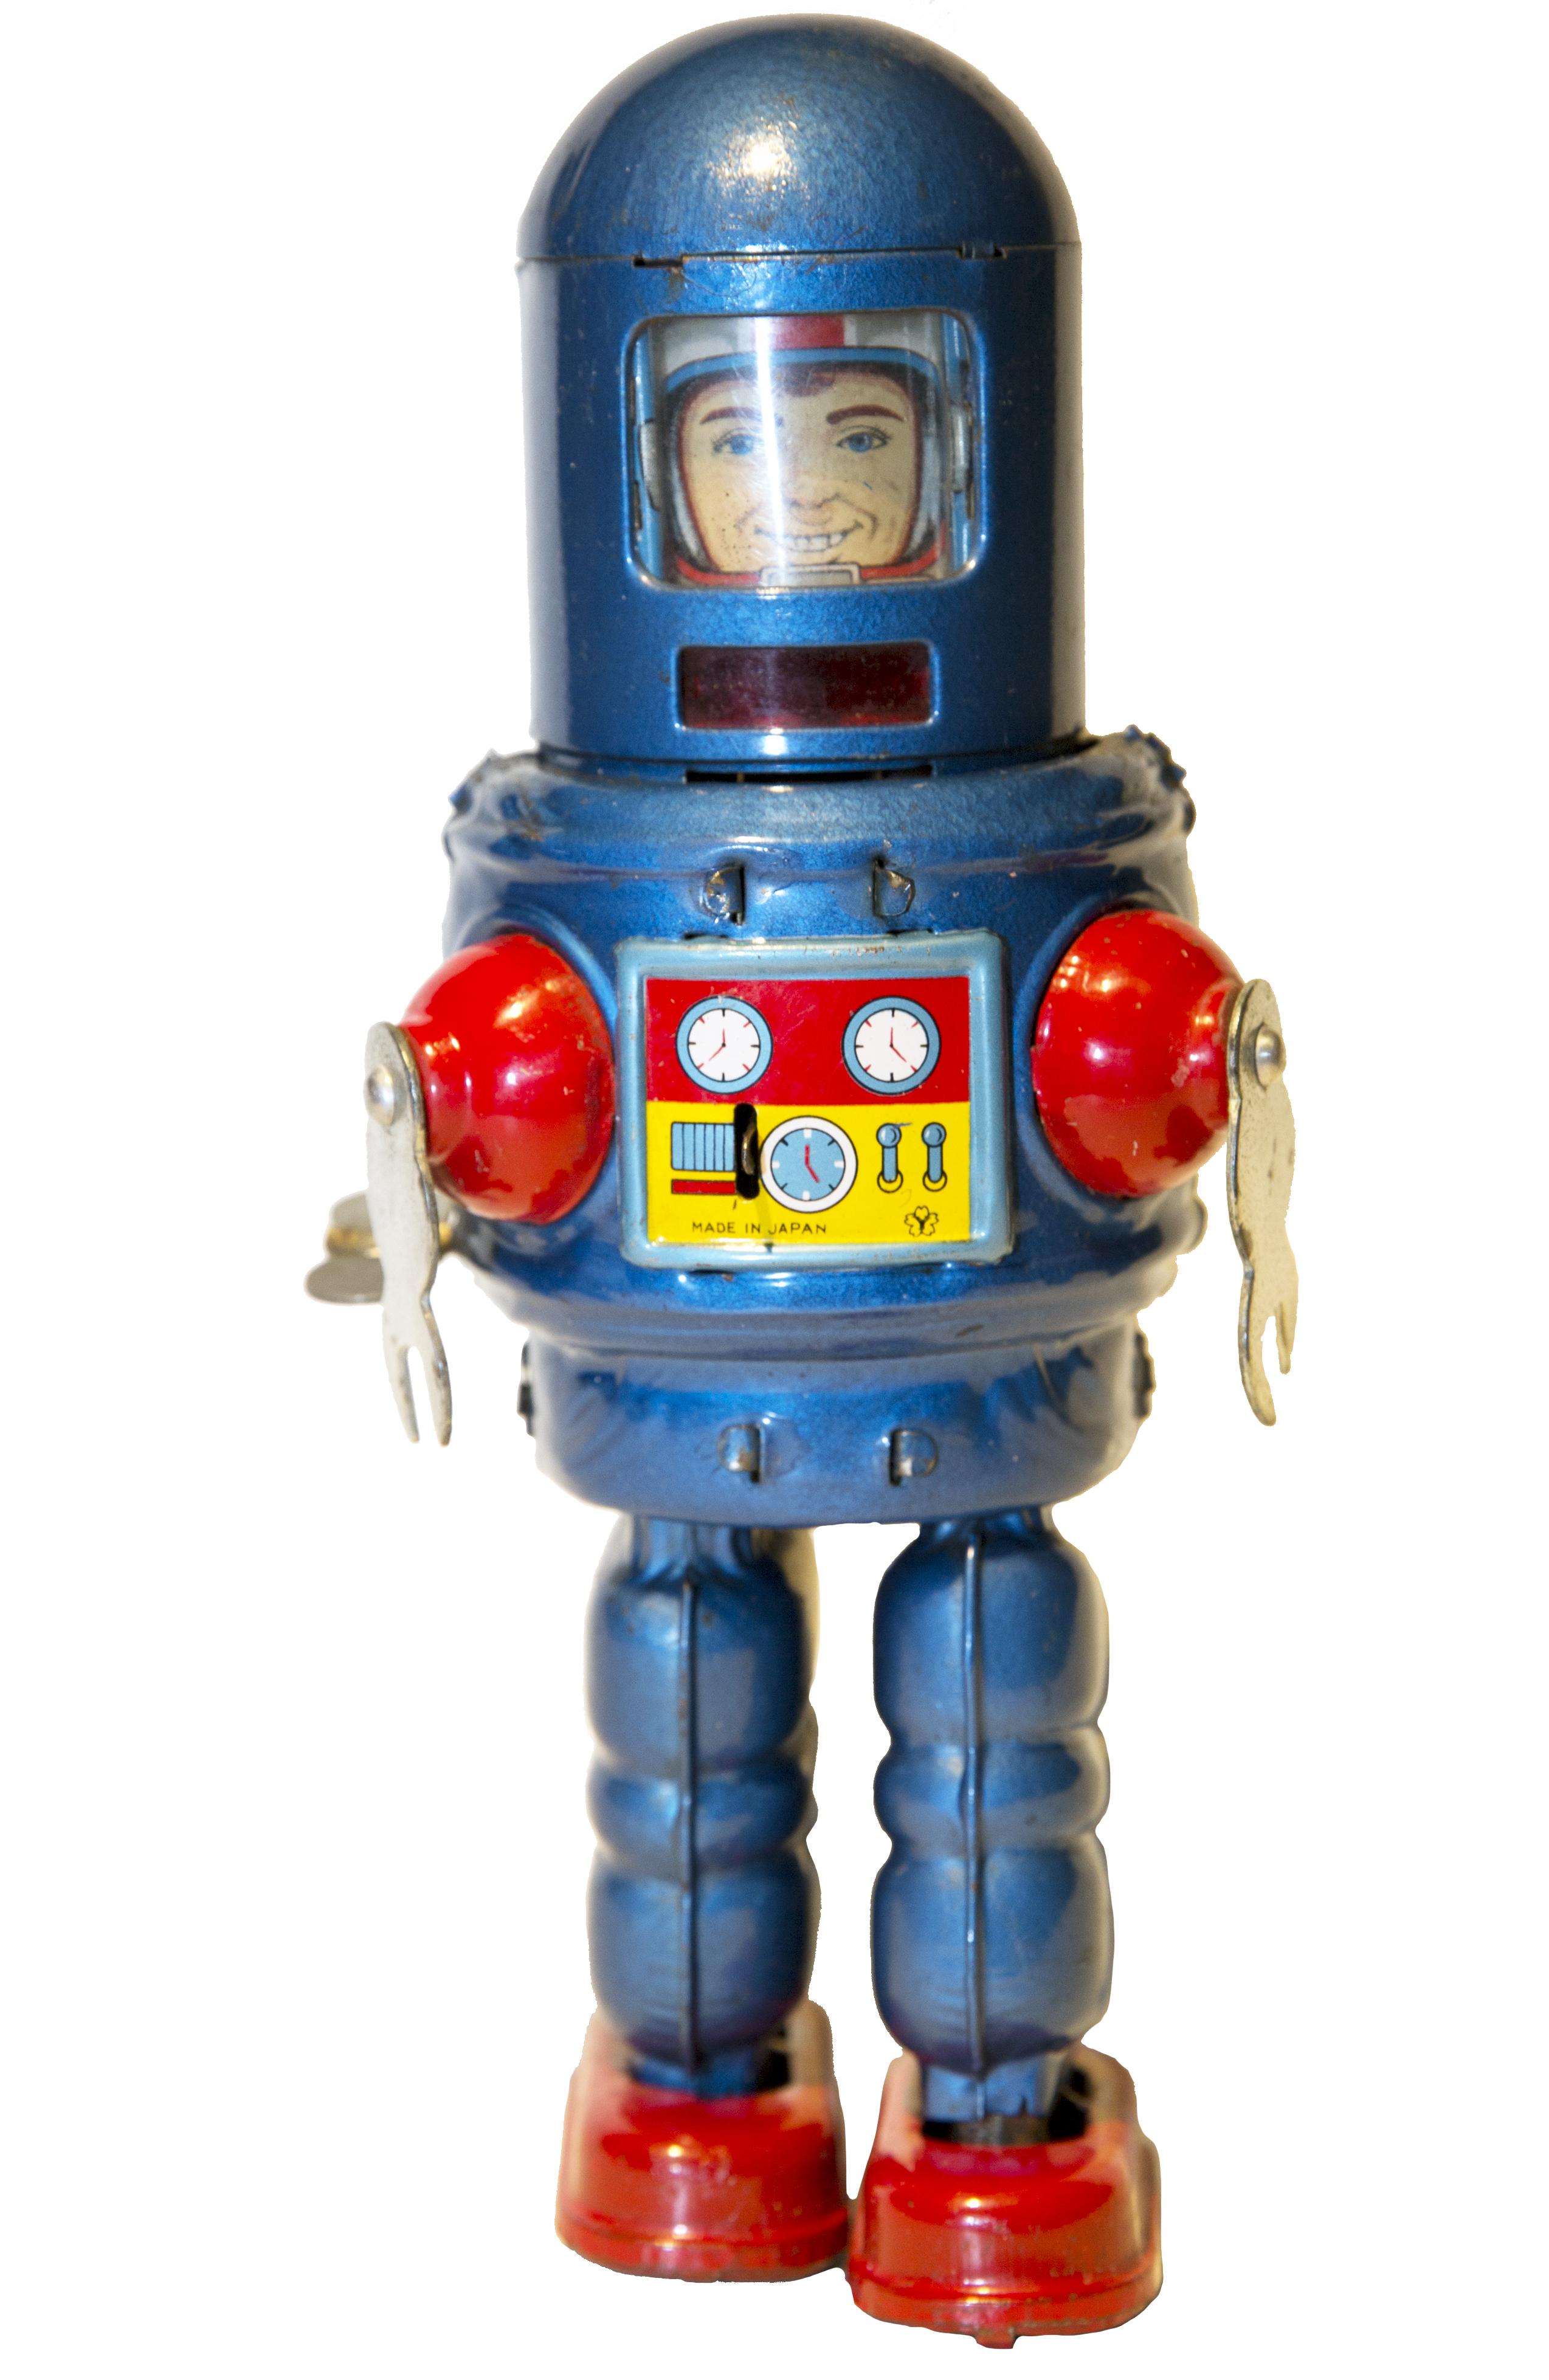 TR-313